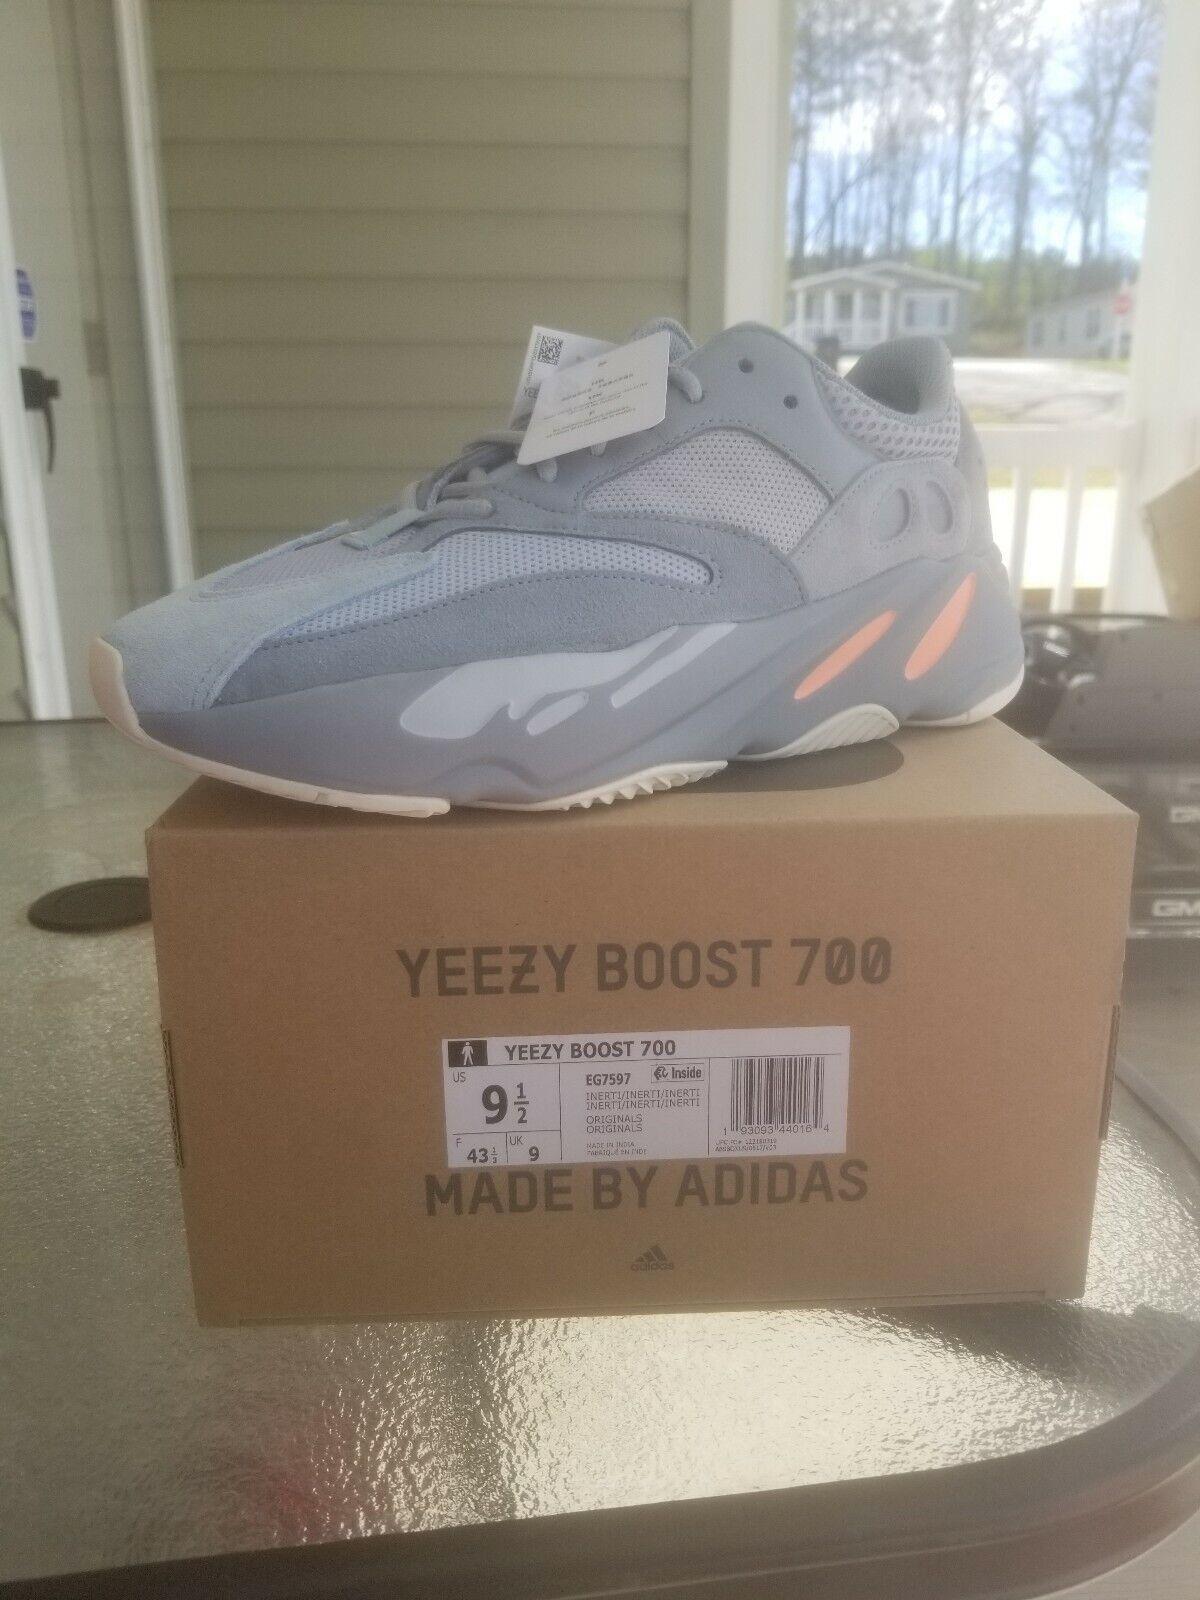 Yeezy Boost 700 Inertia Size 9.5